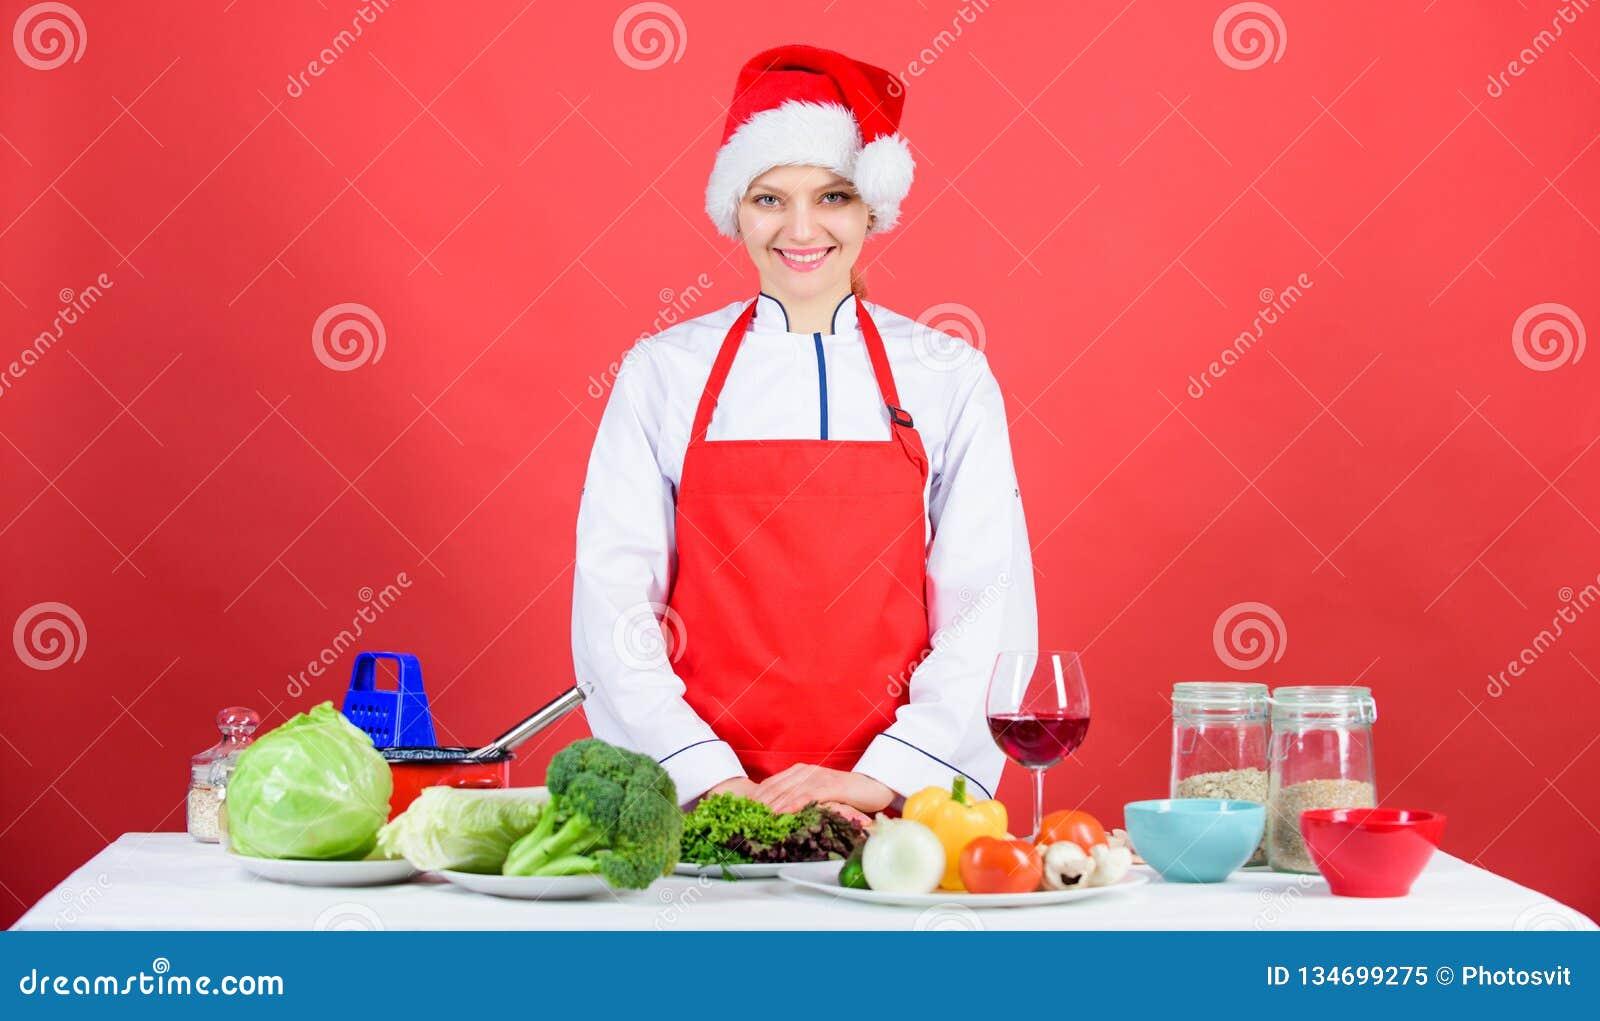 Christmas Dinner Ideas Woman Chef Cooking Christmas Dinner Wear